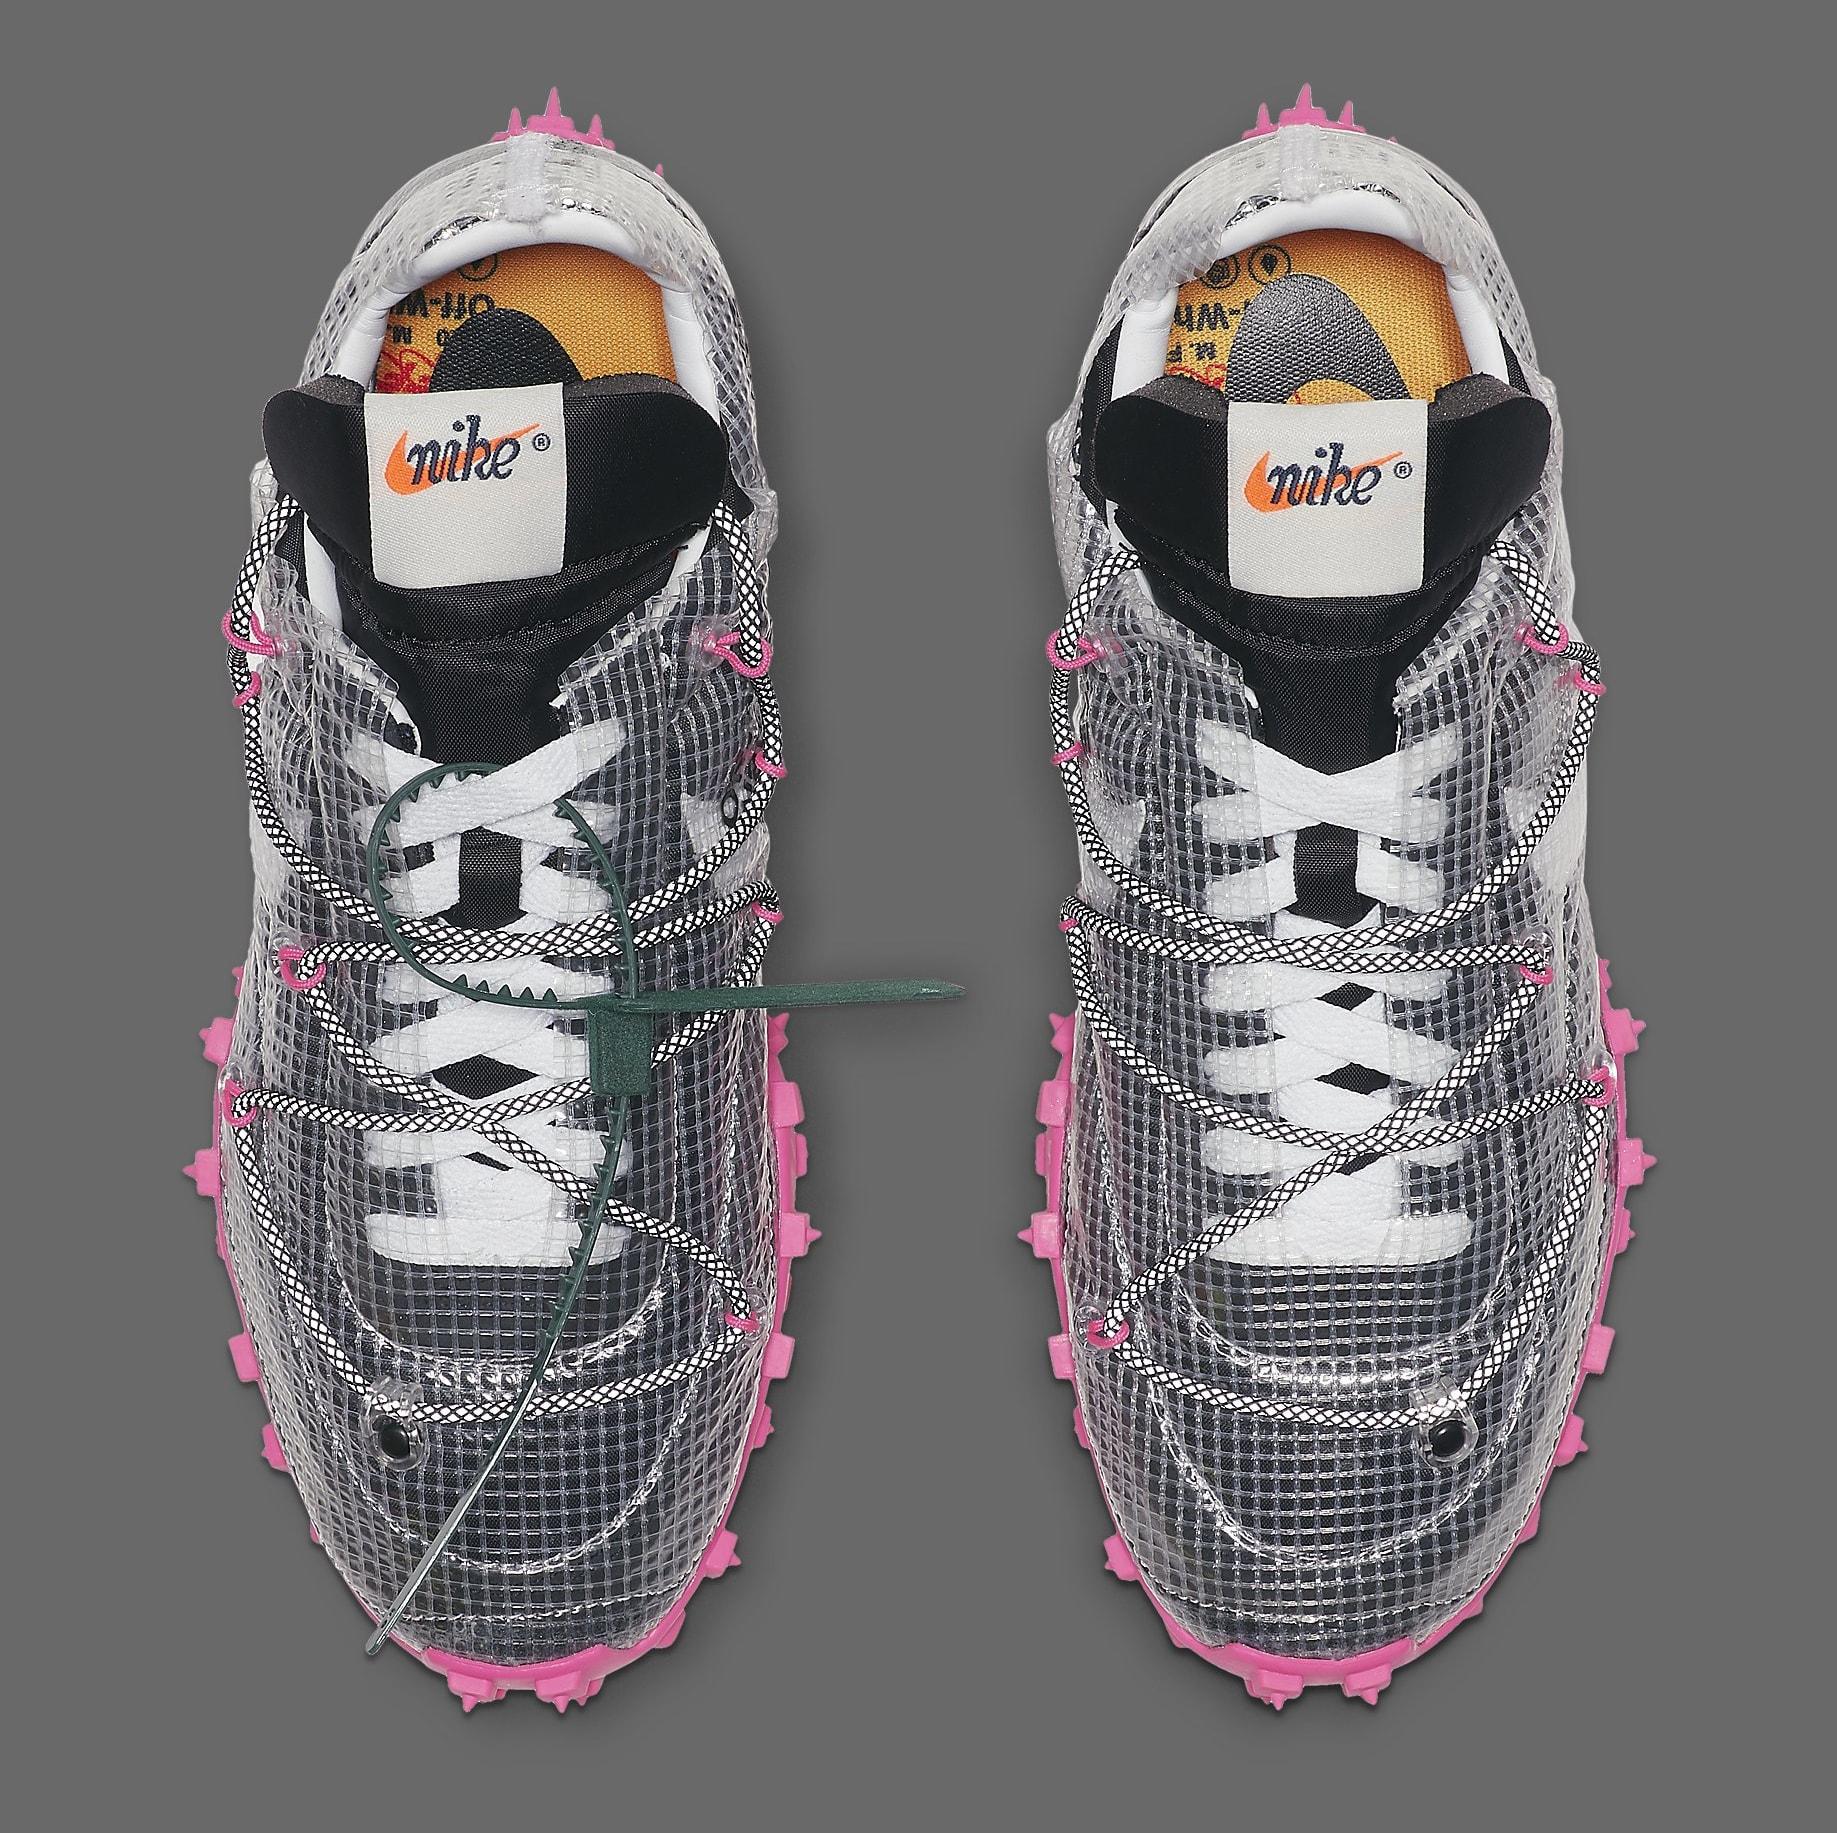 off-white-nike-waffle-racer-womens-fuchsia-cd8180-001-top